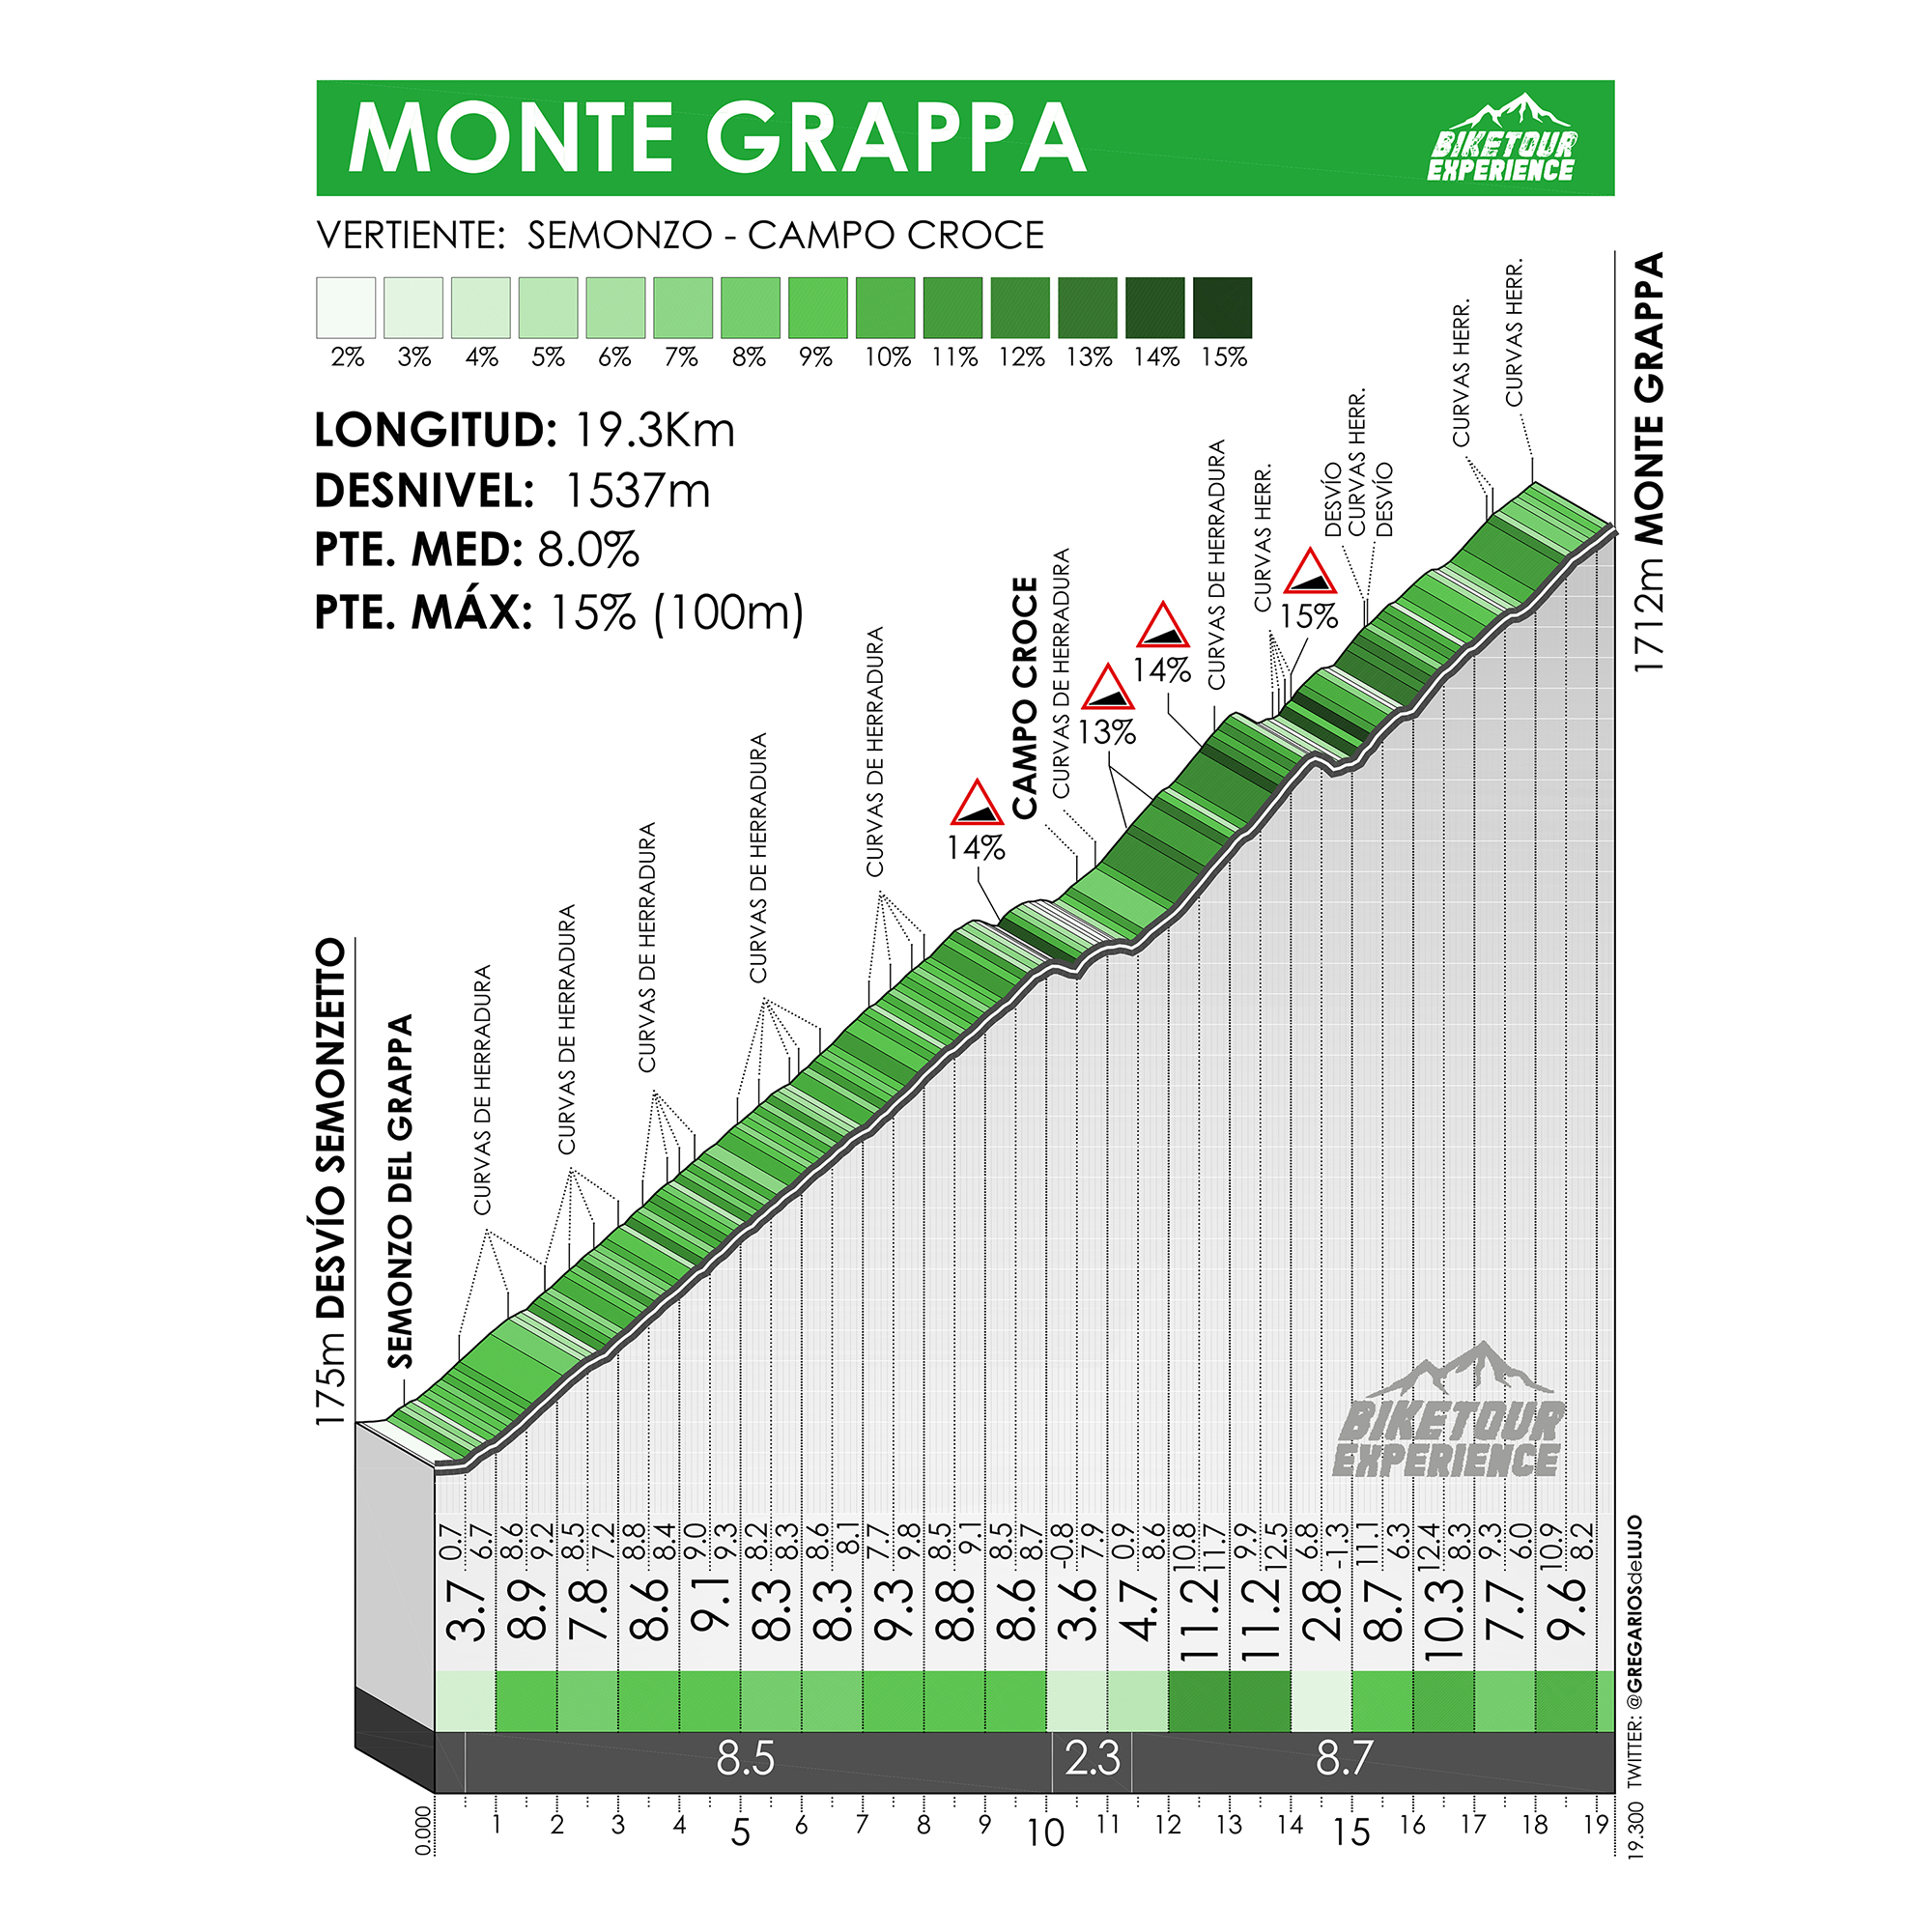 Altimetria del Monte Grappa, en Italia